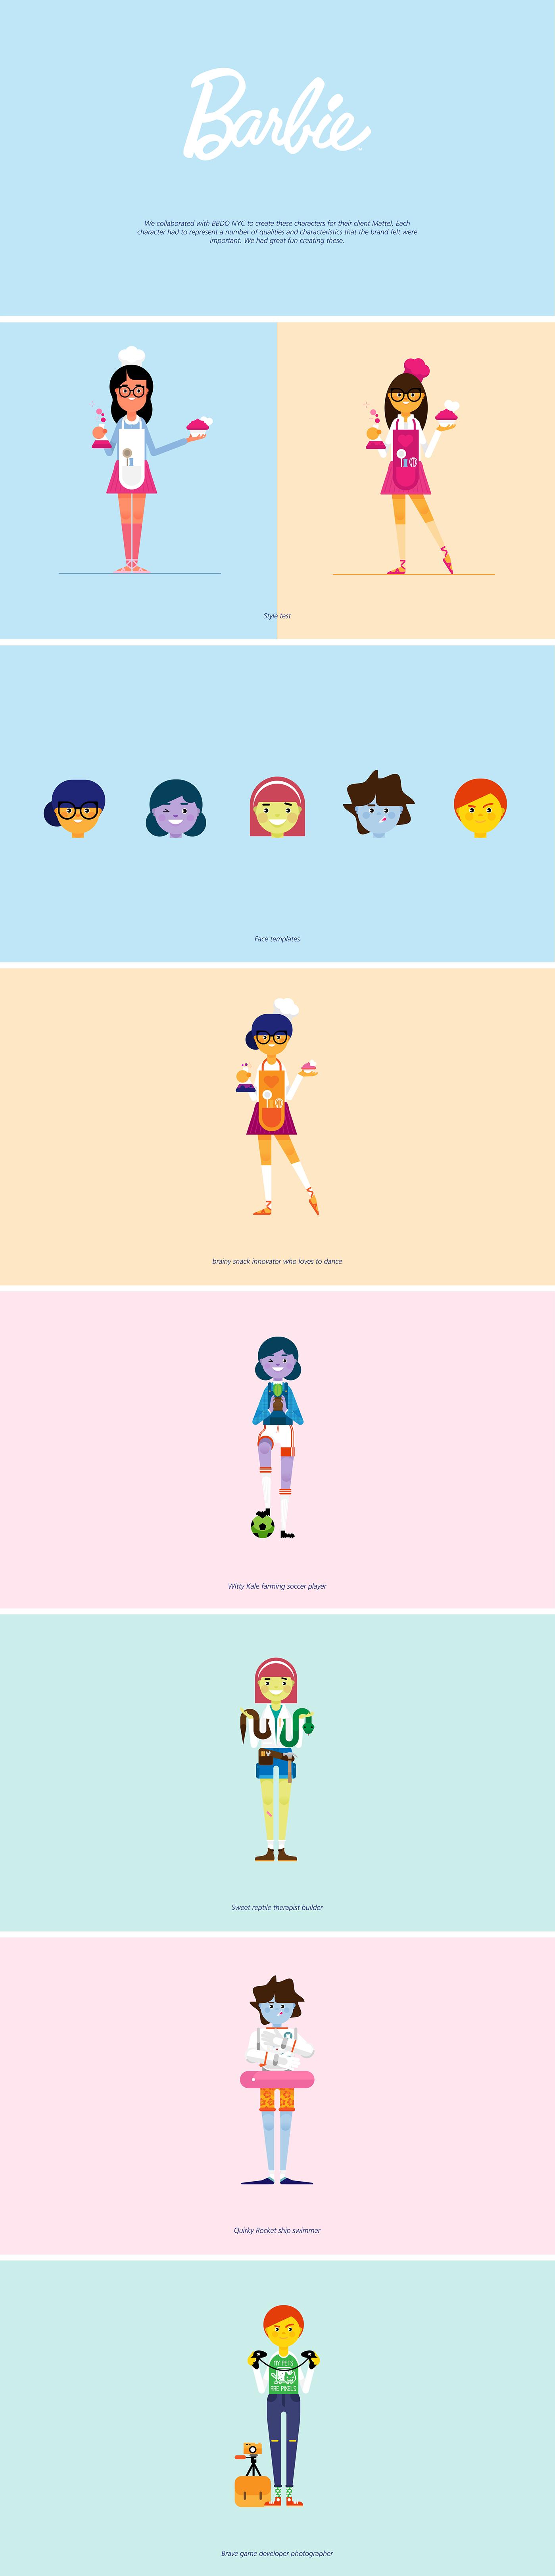 https://www.behance.net/gallery/40193563/Barbie-character-design